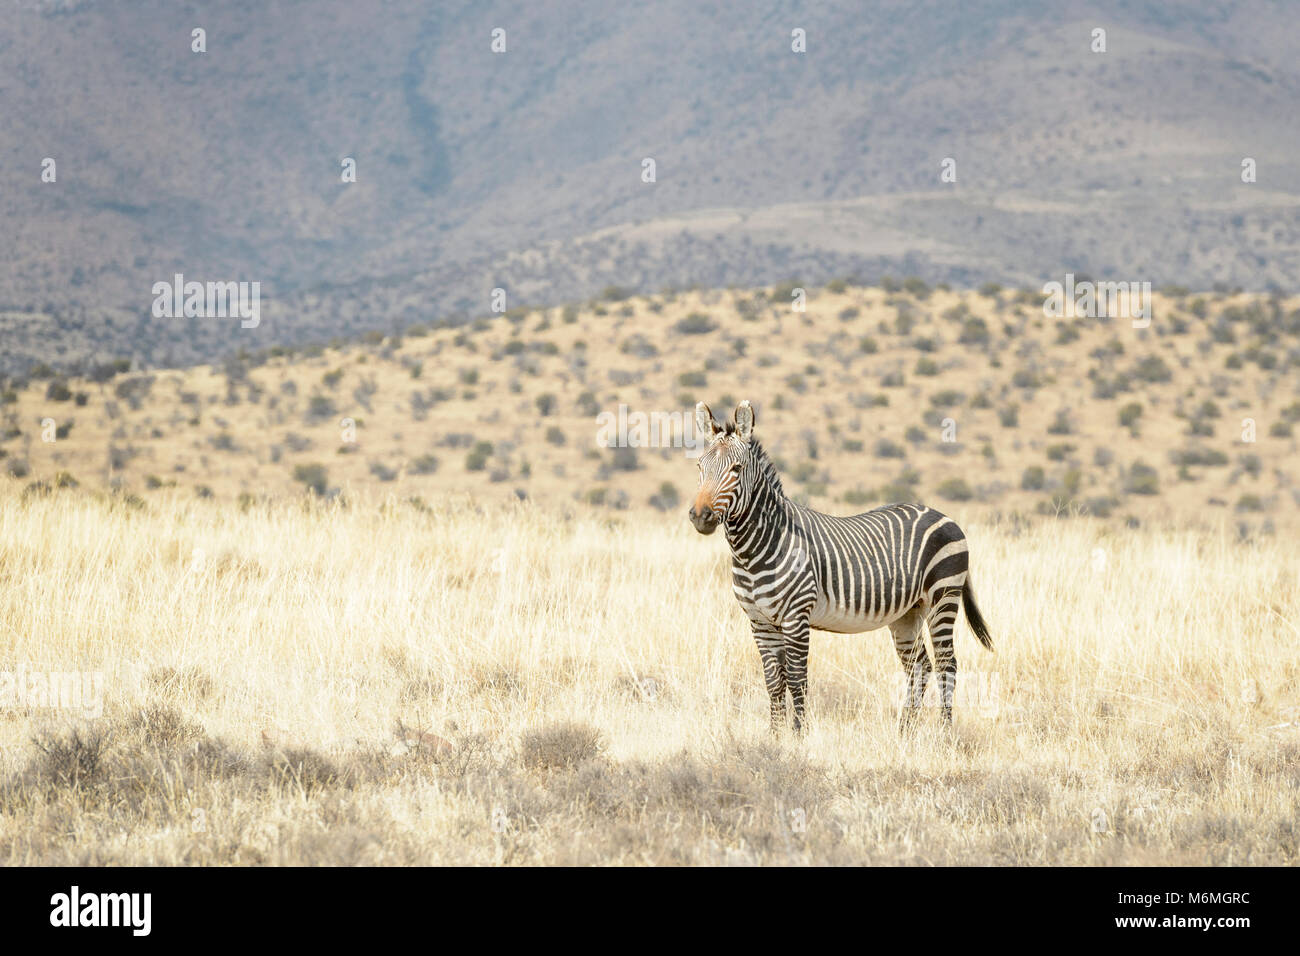 Mountain Zebra (Equus zebra), Mountain Zebra National Park, South Africa - Stock Image